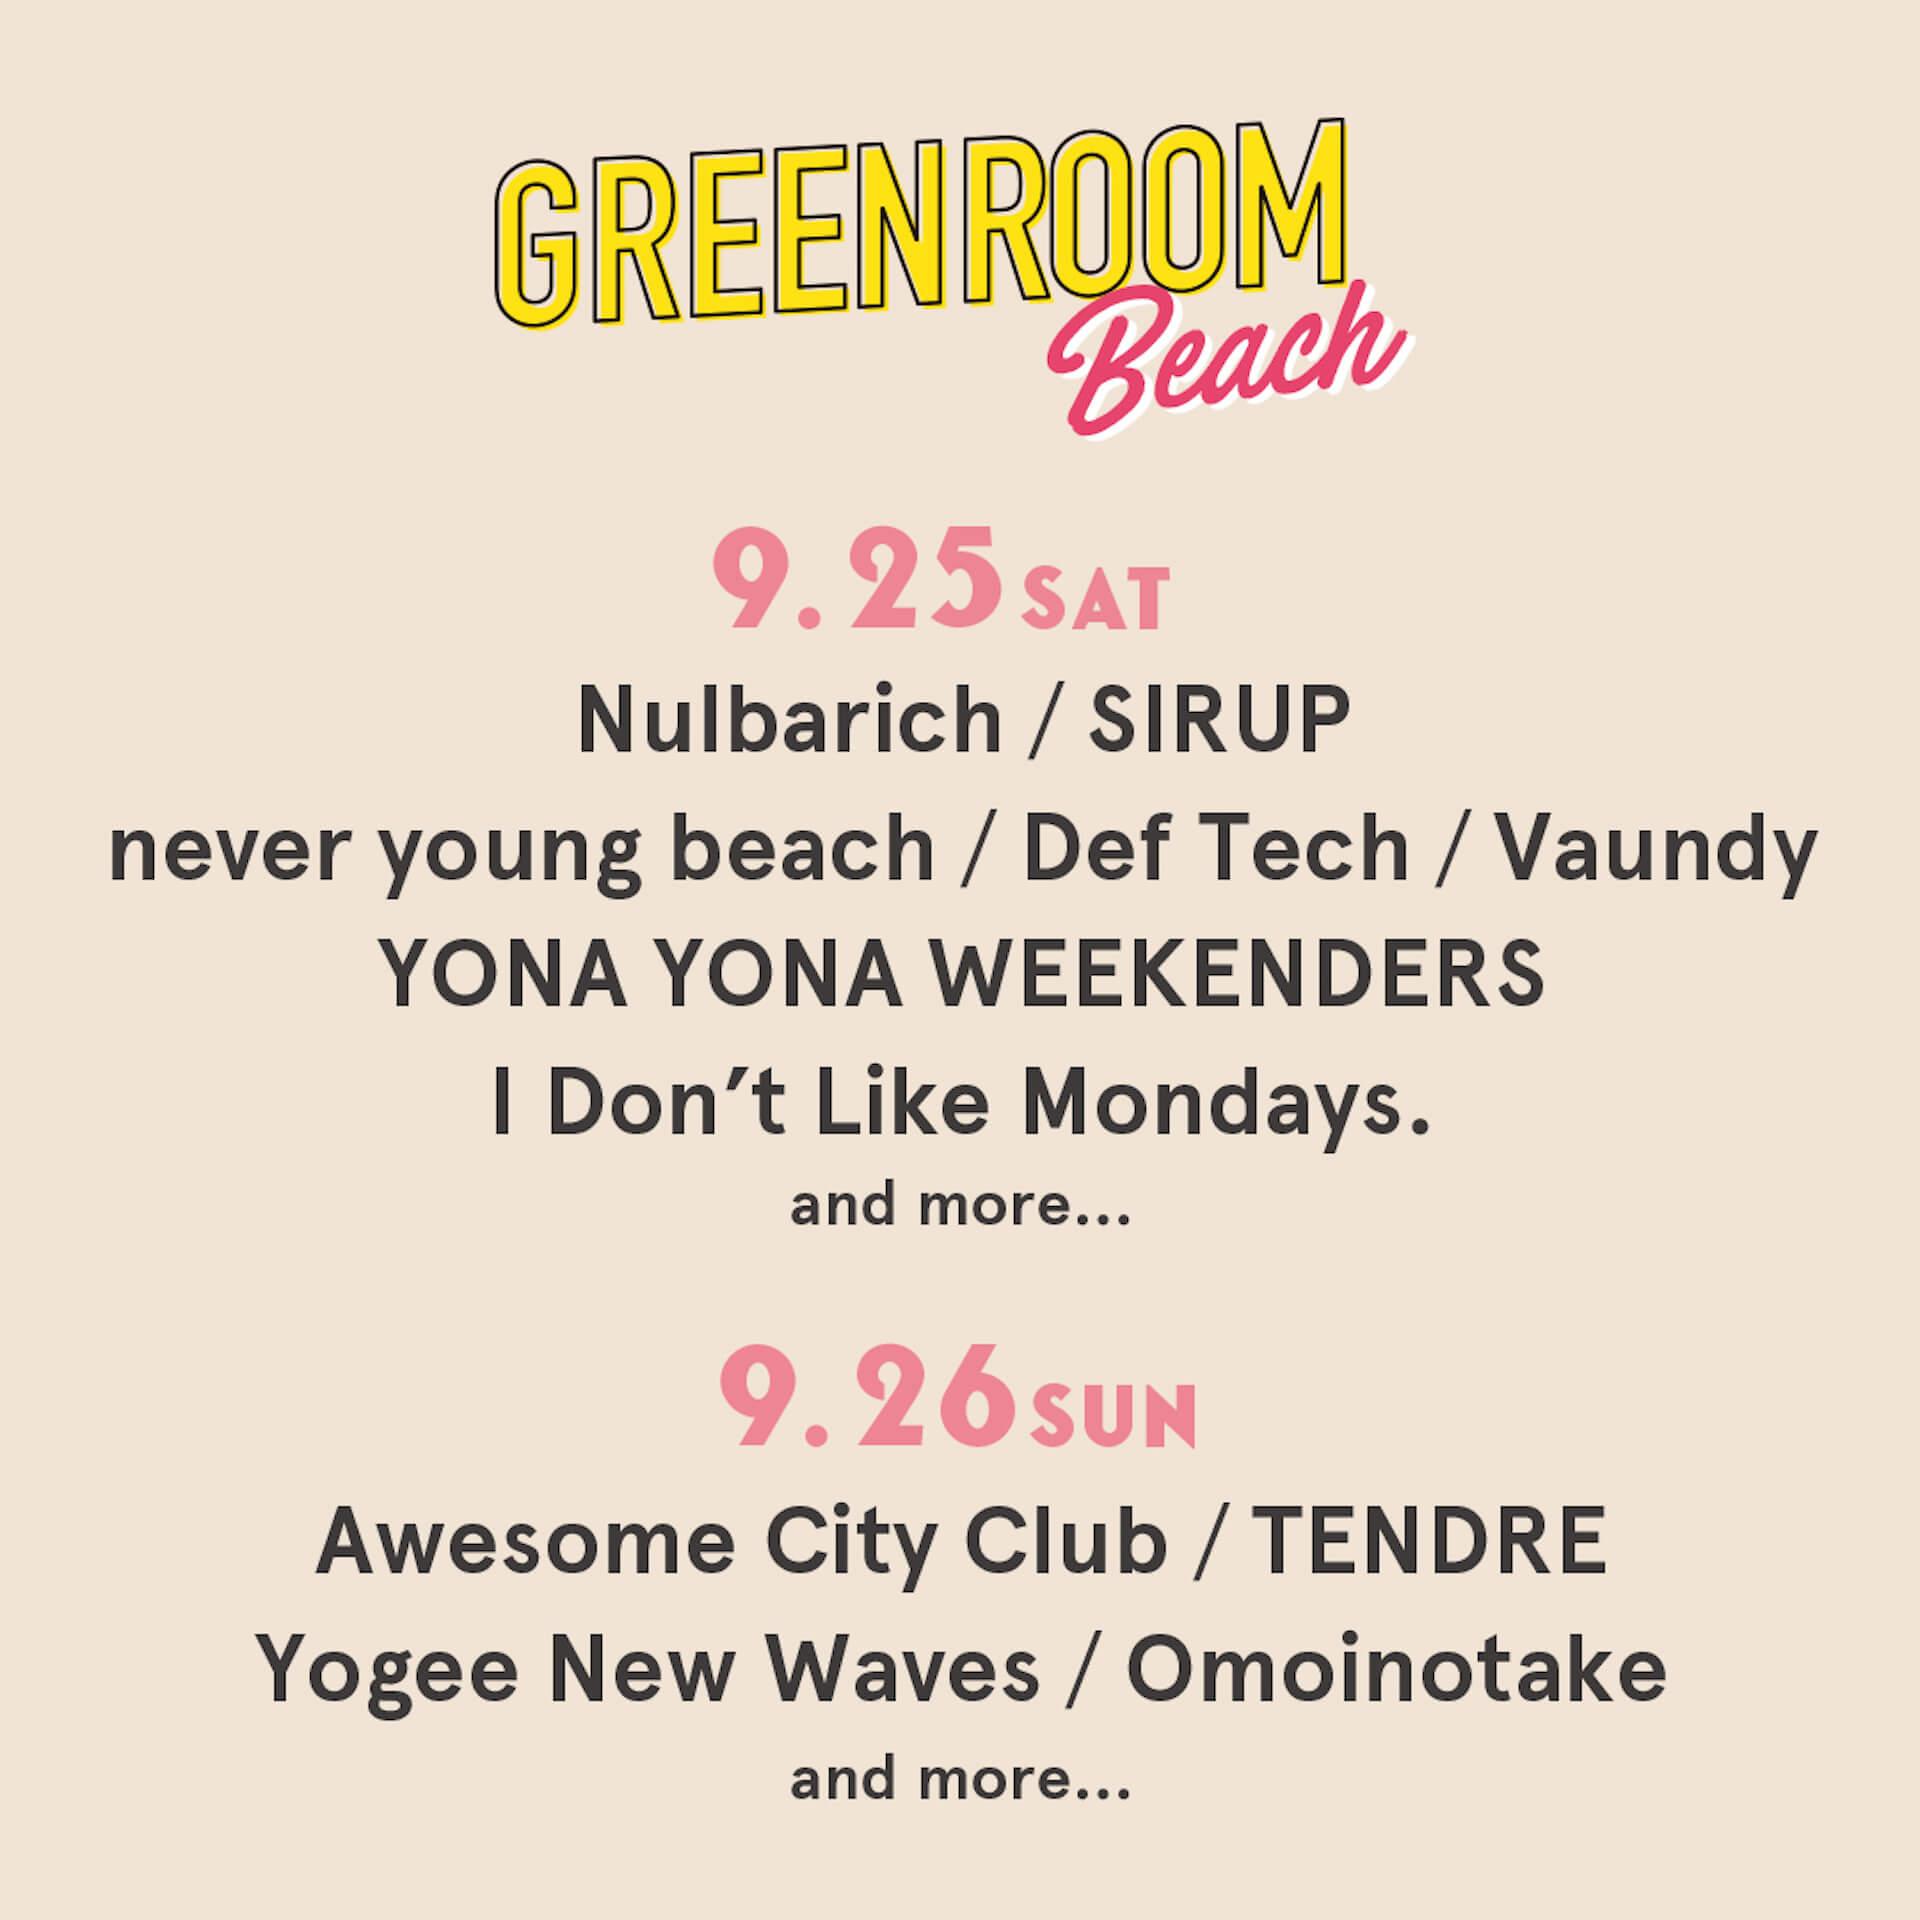 <GREENROOM BEACH>が日割りと追加出演アーティストを発表!I Don't Like Mondays.、Omoinotakeが追加 music210630_greenroombeach3